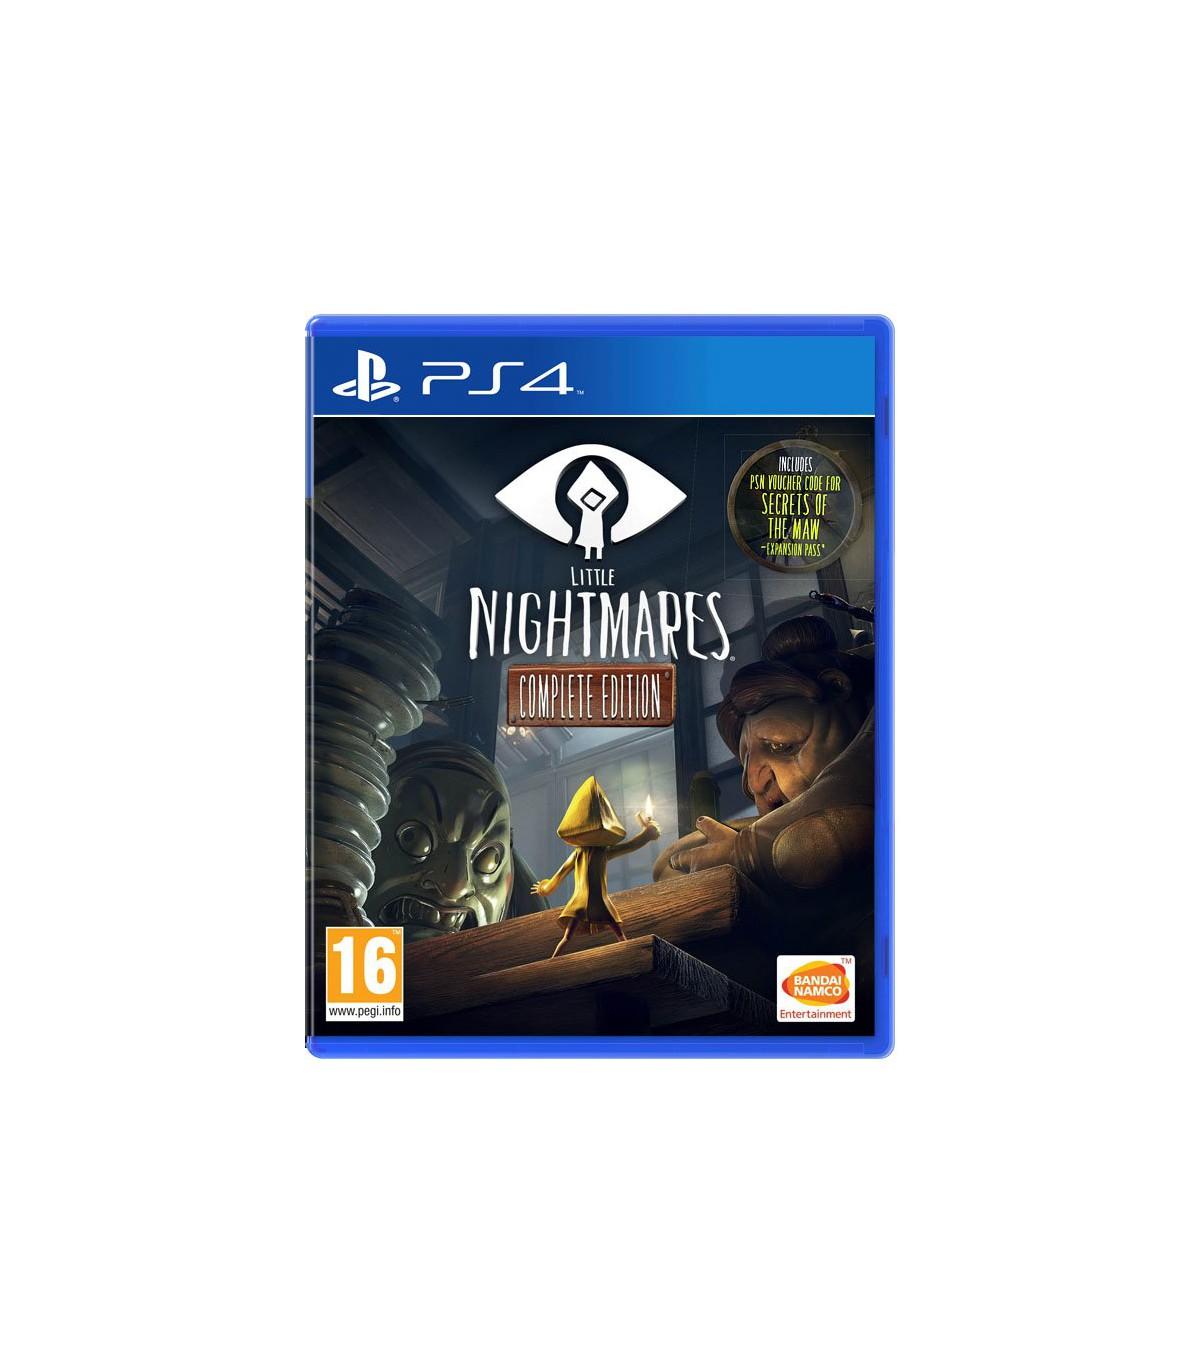 بازی Little Nightmares - پلی استیشن 4